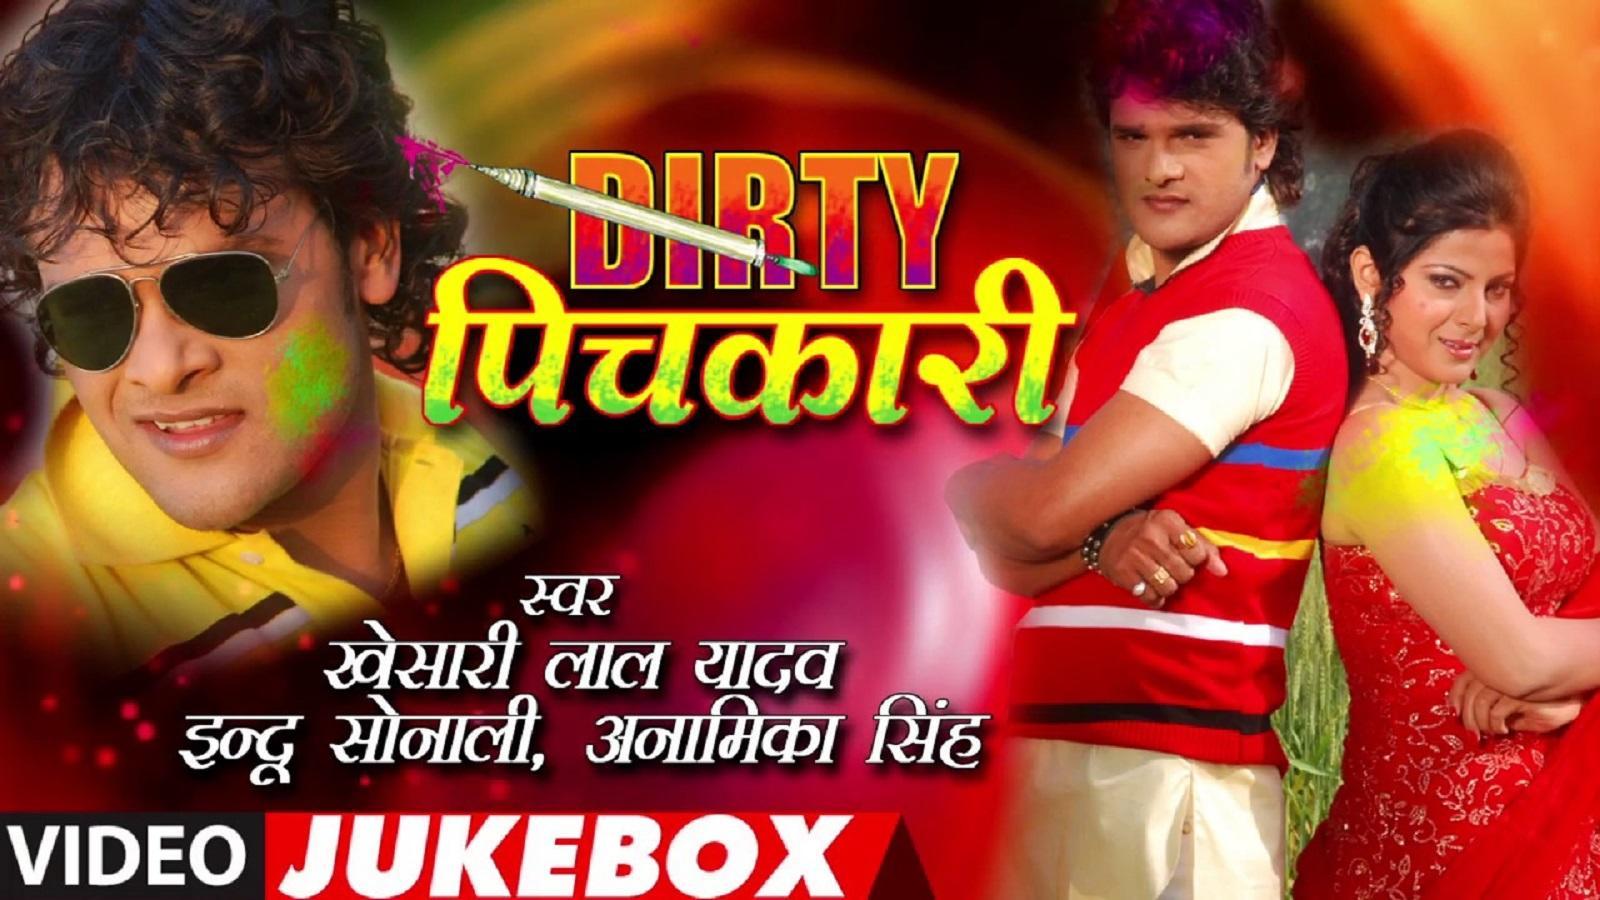 होली के गाने Holi Gana Bhojpuri: Khesari Lal Yadav's Bhojpuri Holi Songs  (VIDEO JUKEBOX)